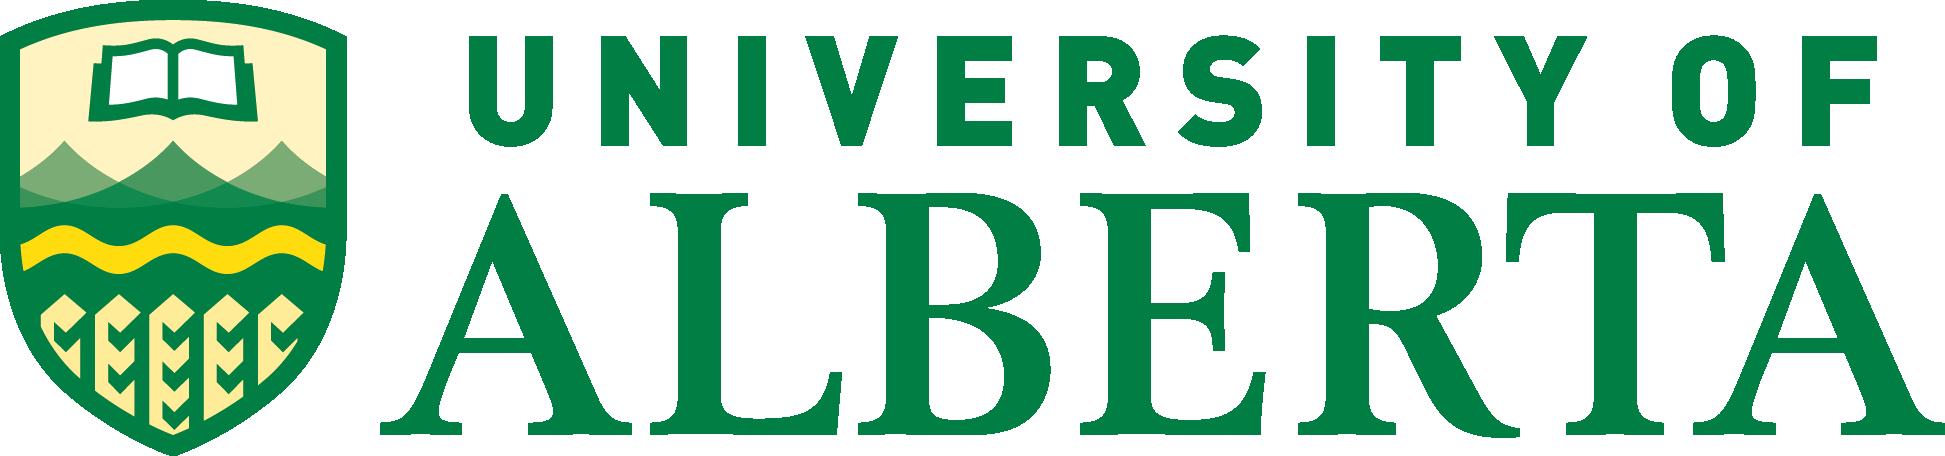 Uofa Calendar 2020 University of Alberta   Acalog ACMS™